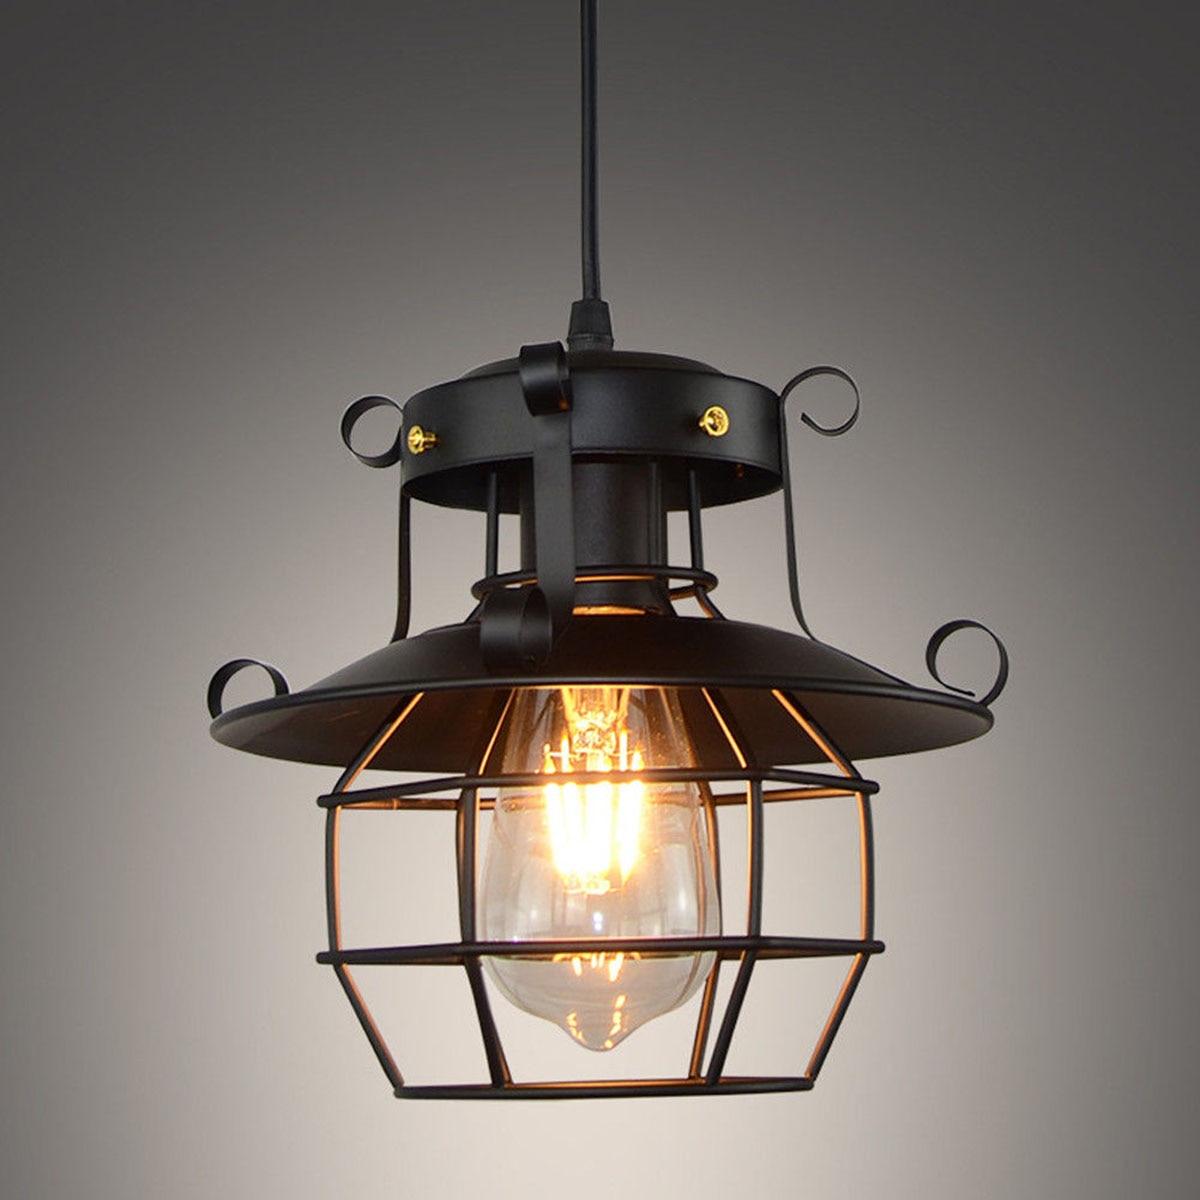 Vintage light Metal Industrial Light Fixtures Cage Edison Nordic Retro Loft Lamp Home decor Pendant light